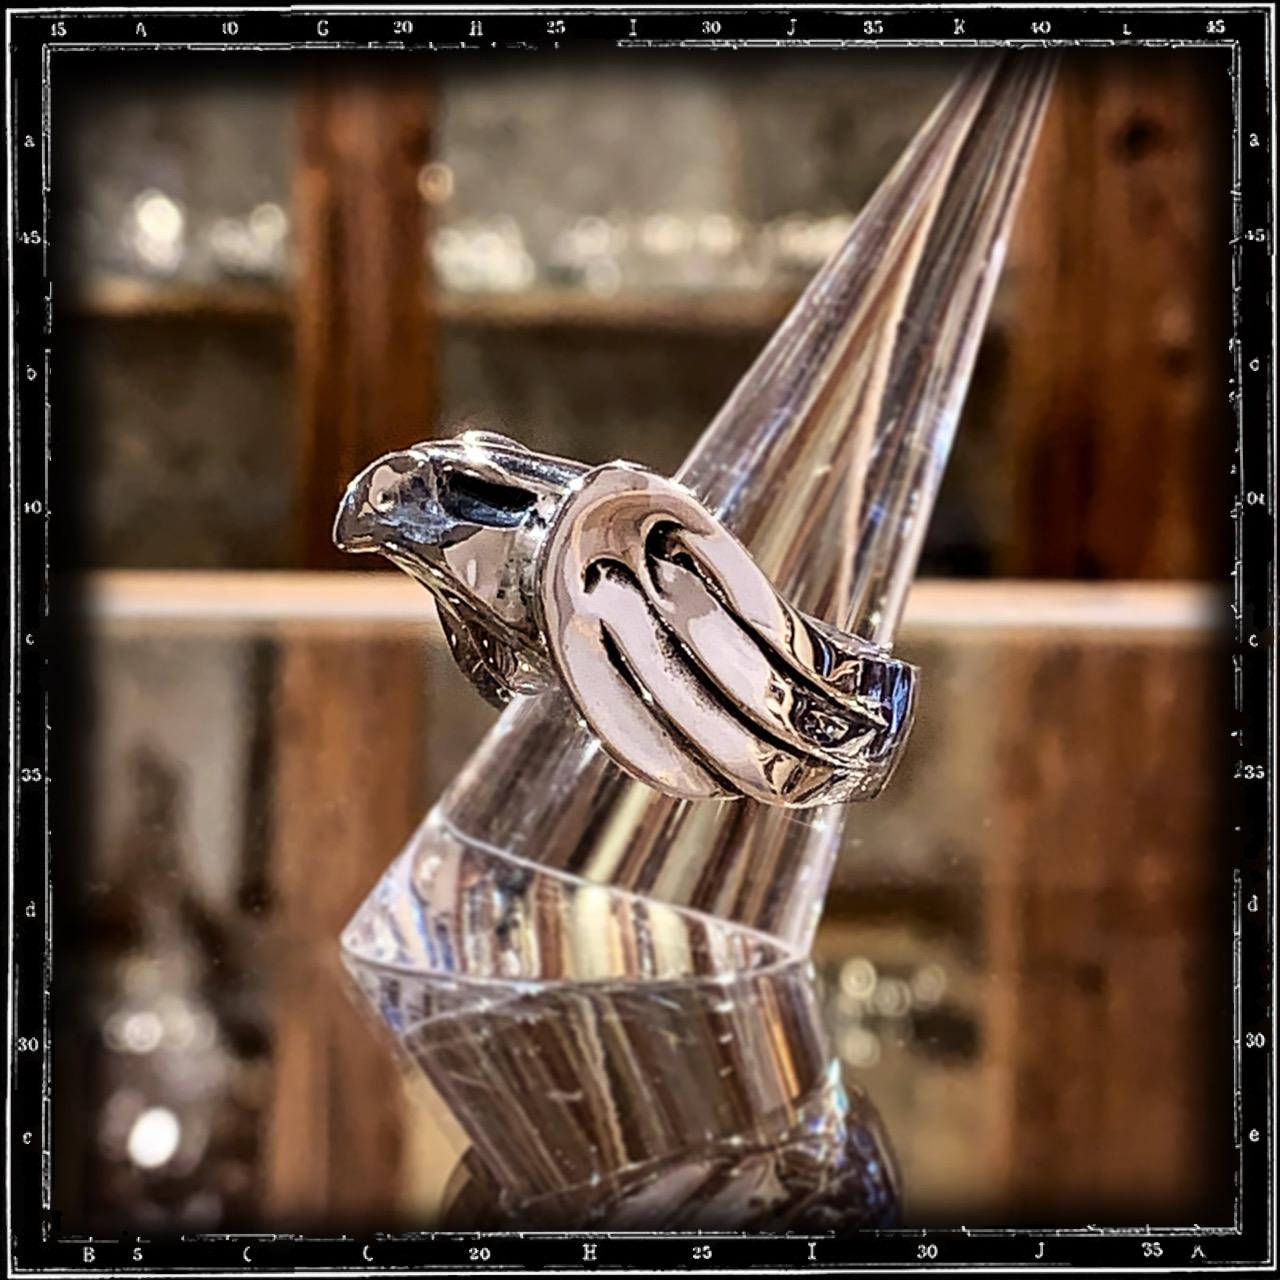 BONNET EAGLE RING